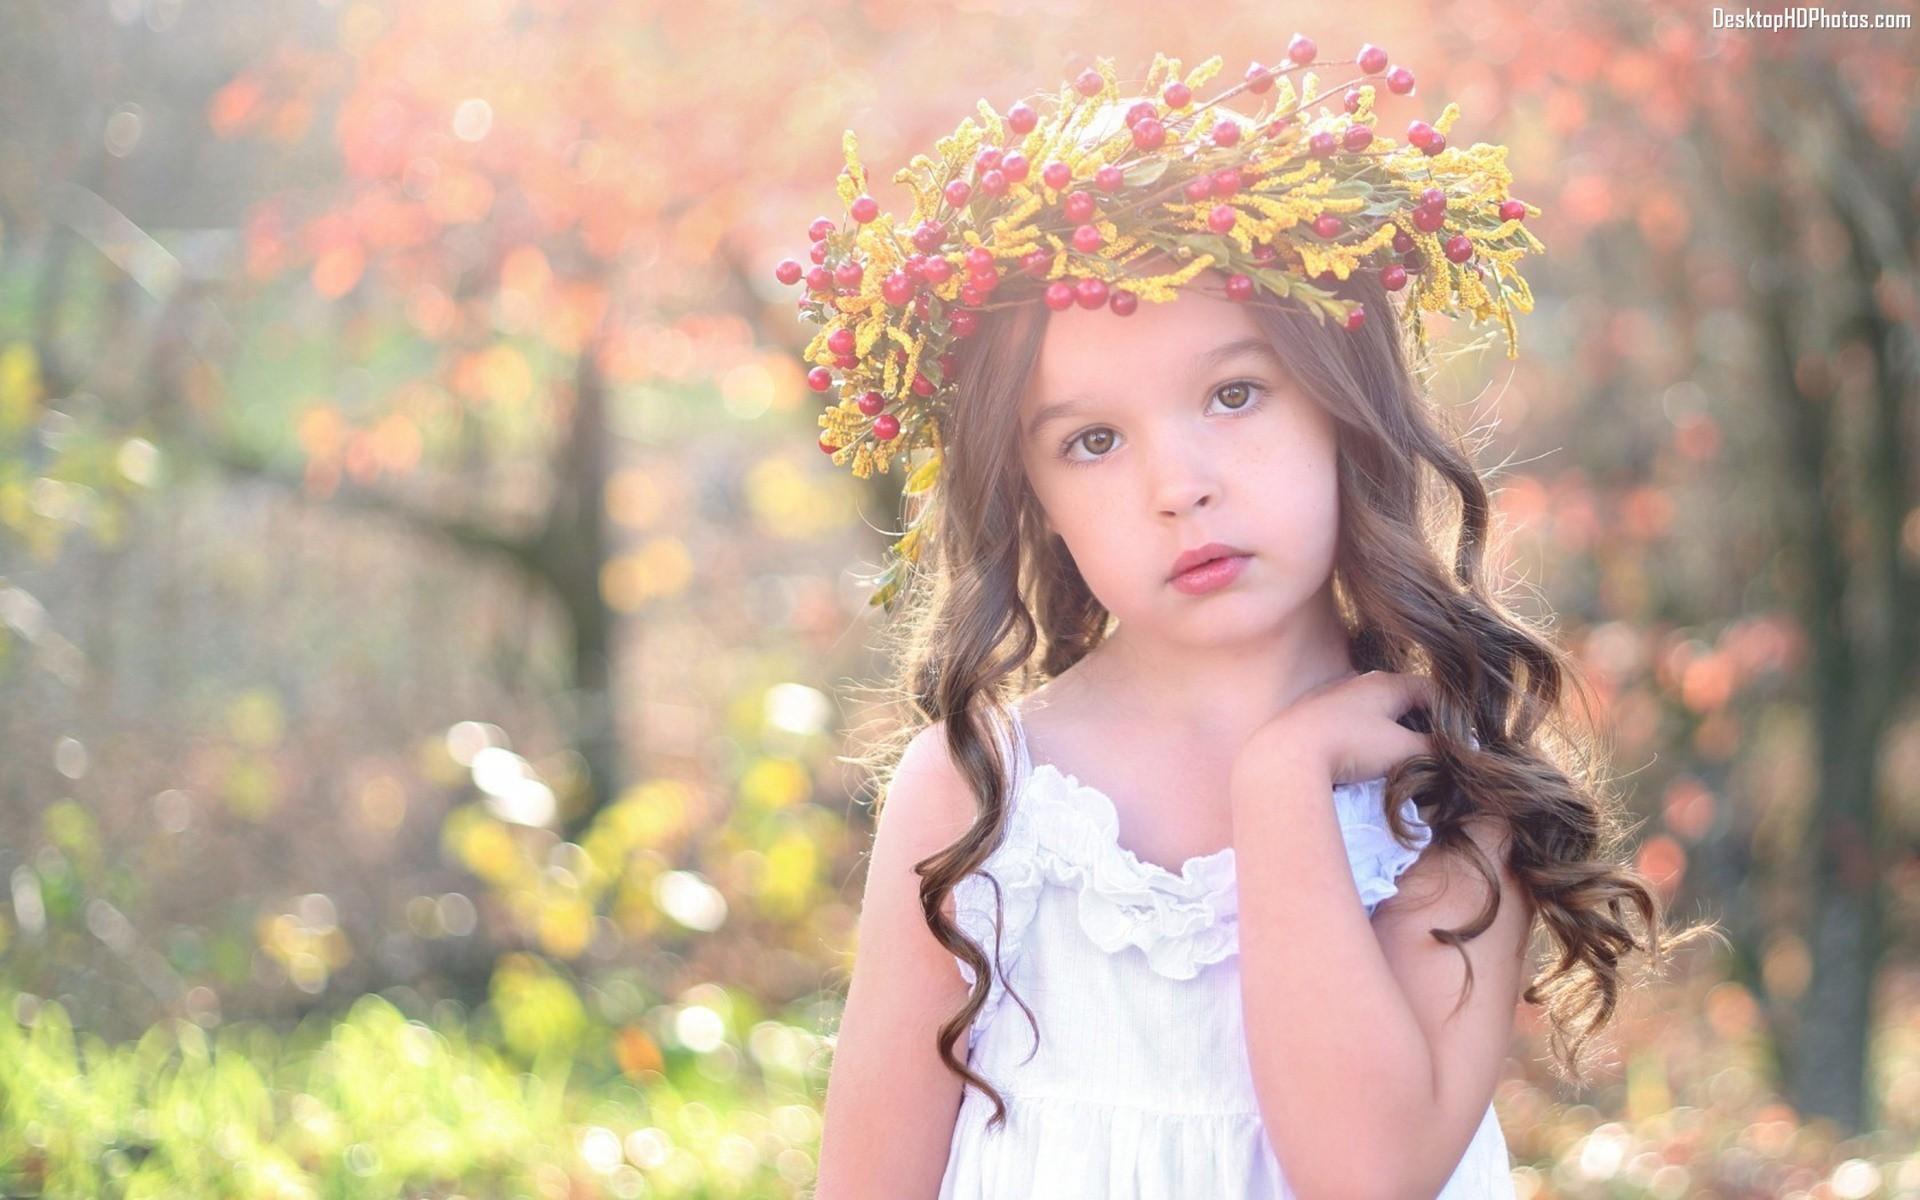 Pics photos pretty baby girl